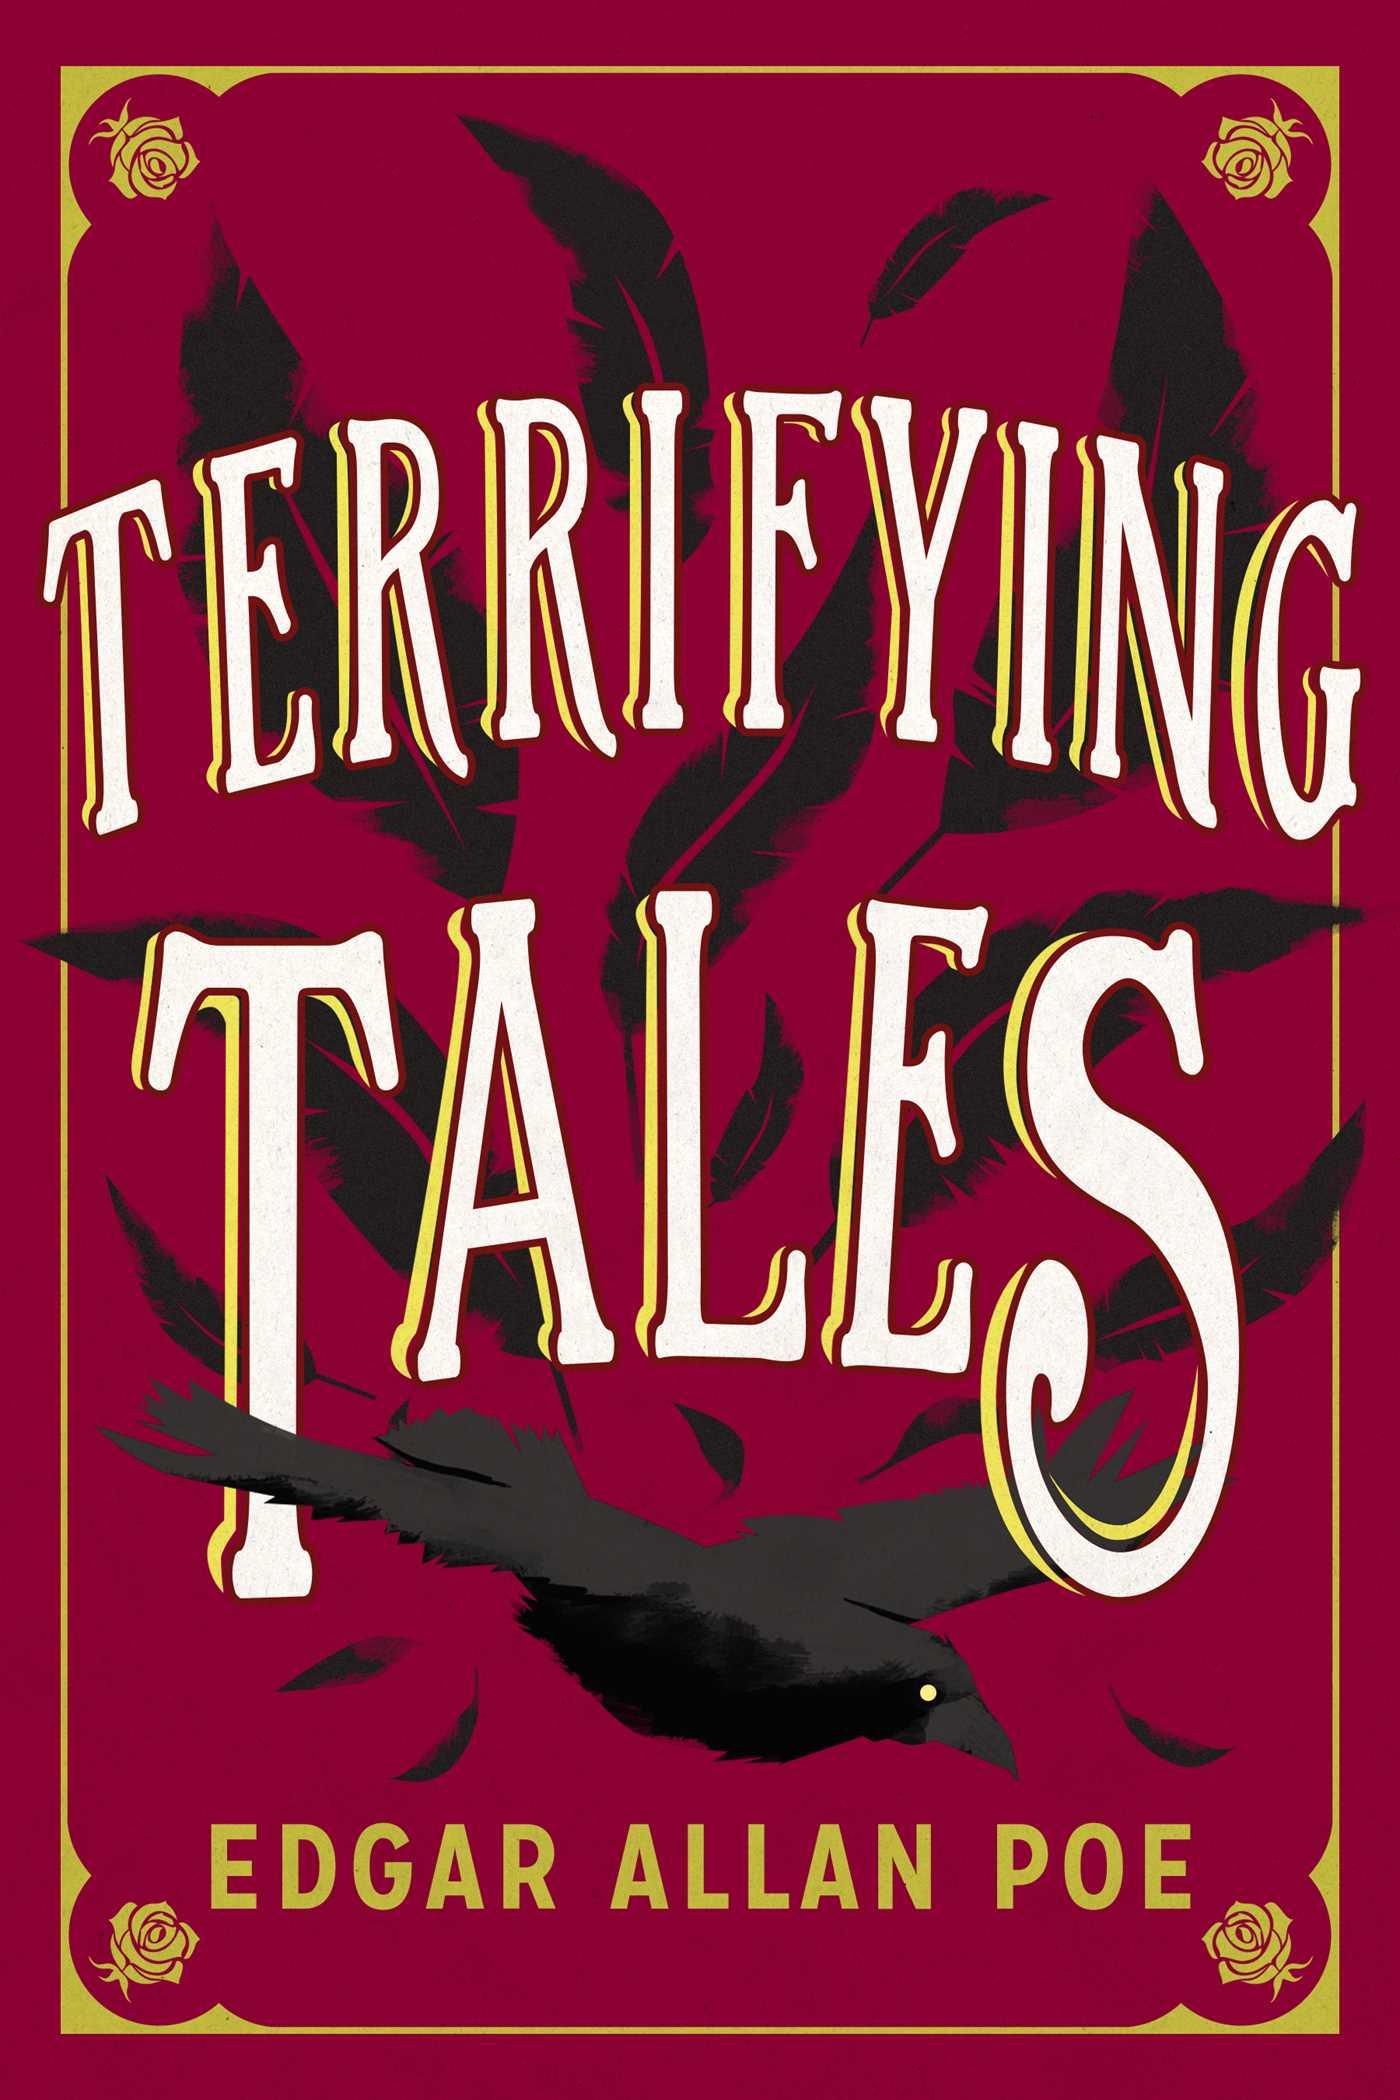 The Terrifying Tales by Edgar Allan Poe eBook by Edgar Allan